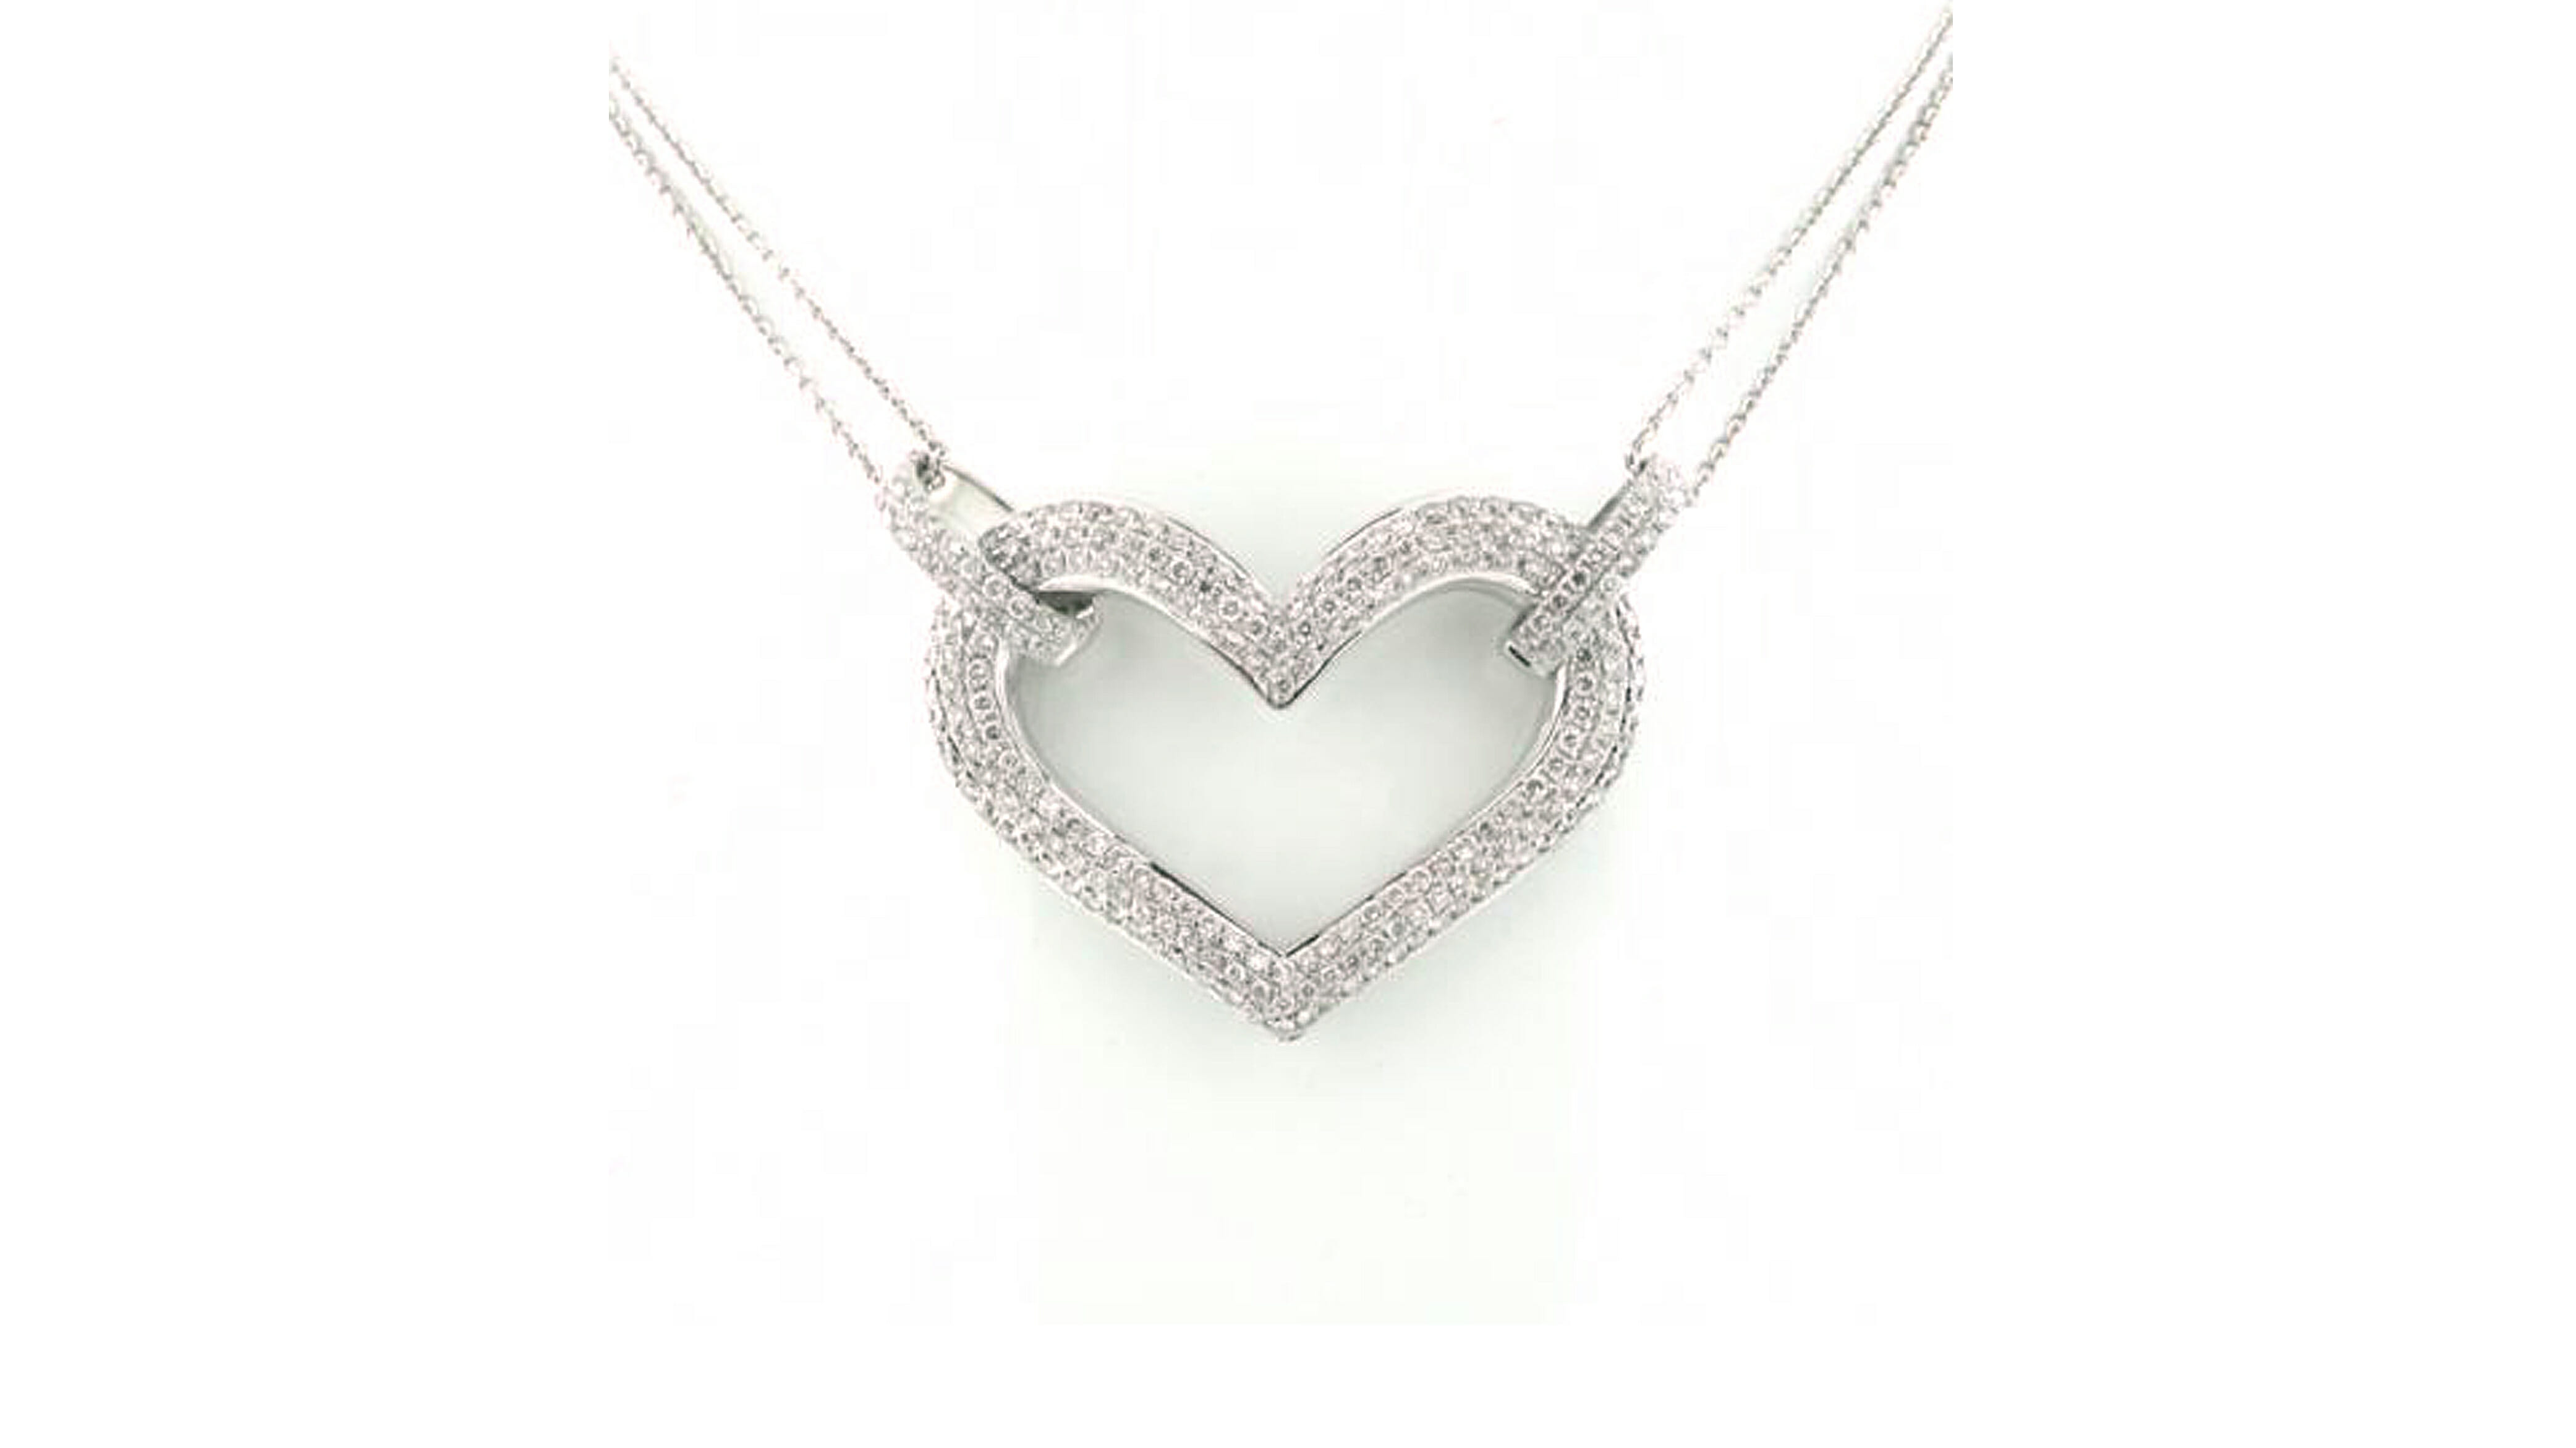 Pave-heart diamond pendant | White Gold Diamond Heart Pendant